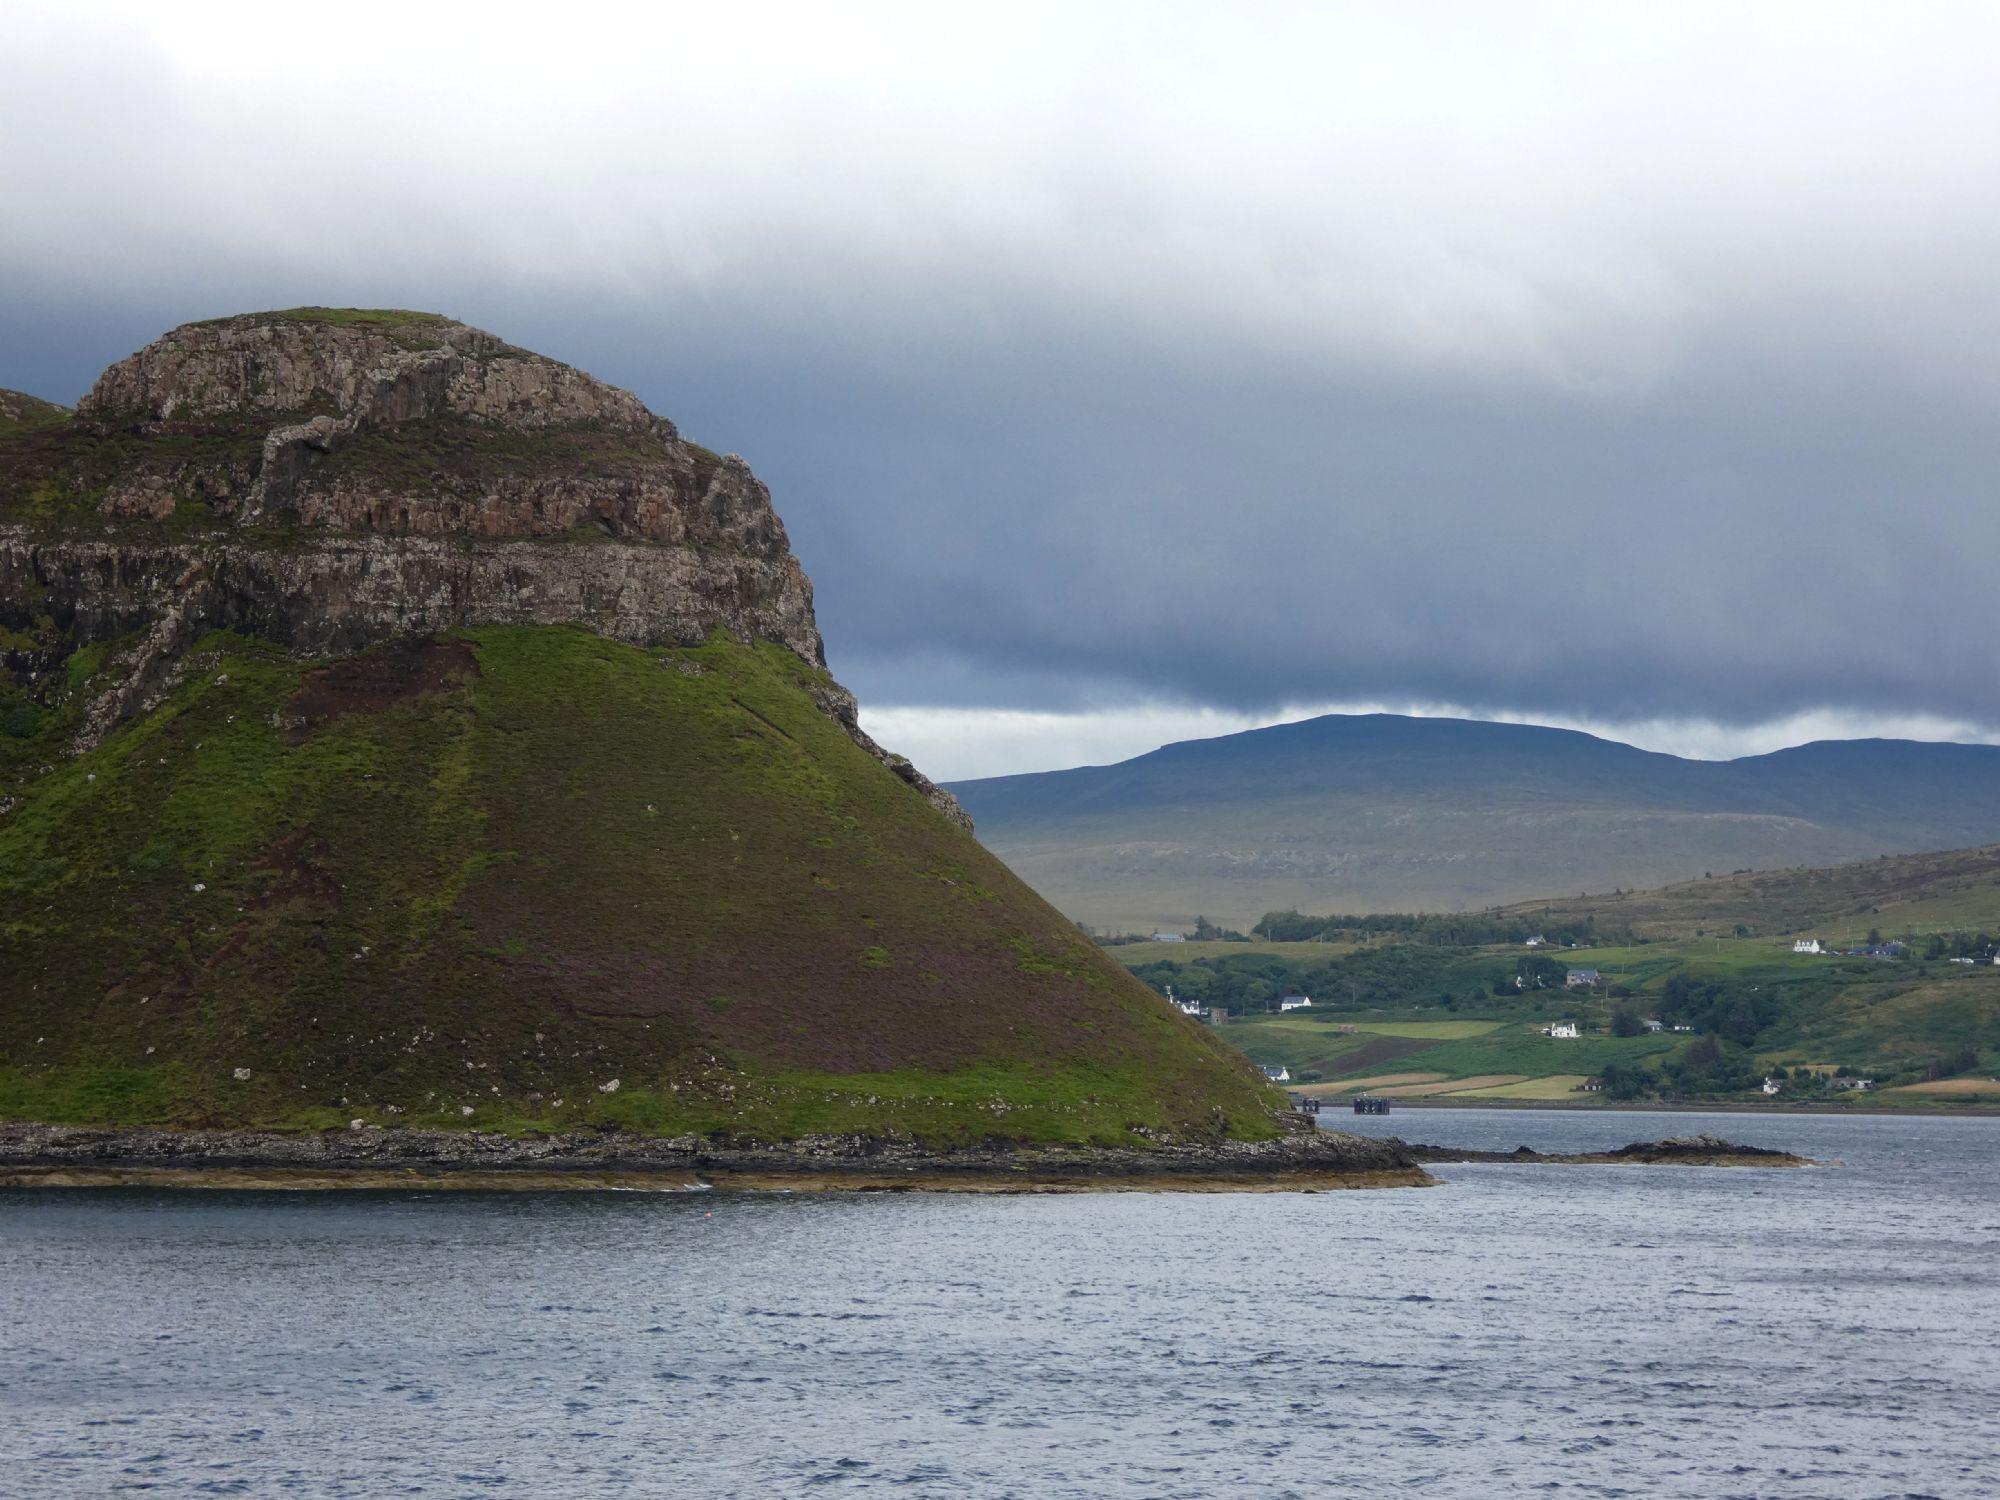 Approaching Uig, north Skye